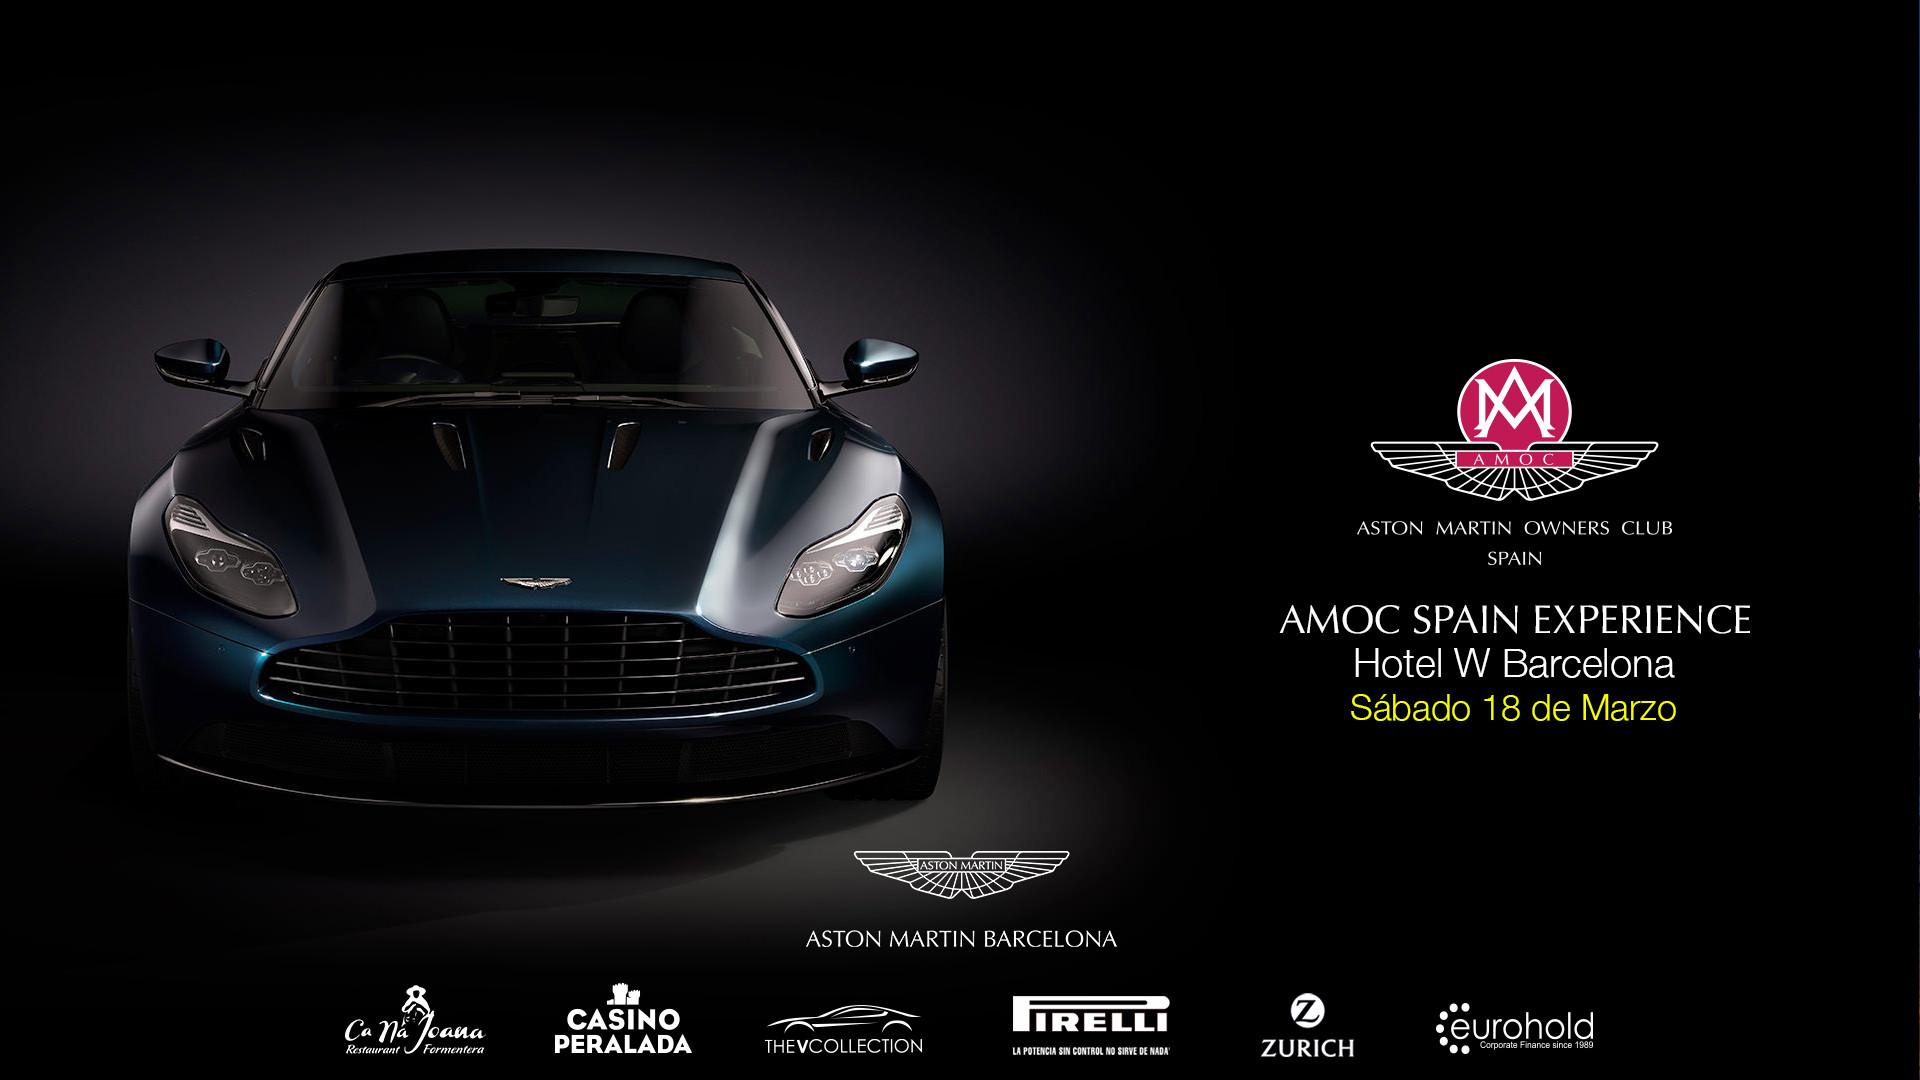 AMOC Spain | Aston Martin Owners Club Spain